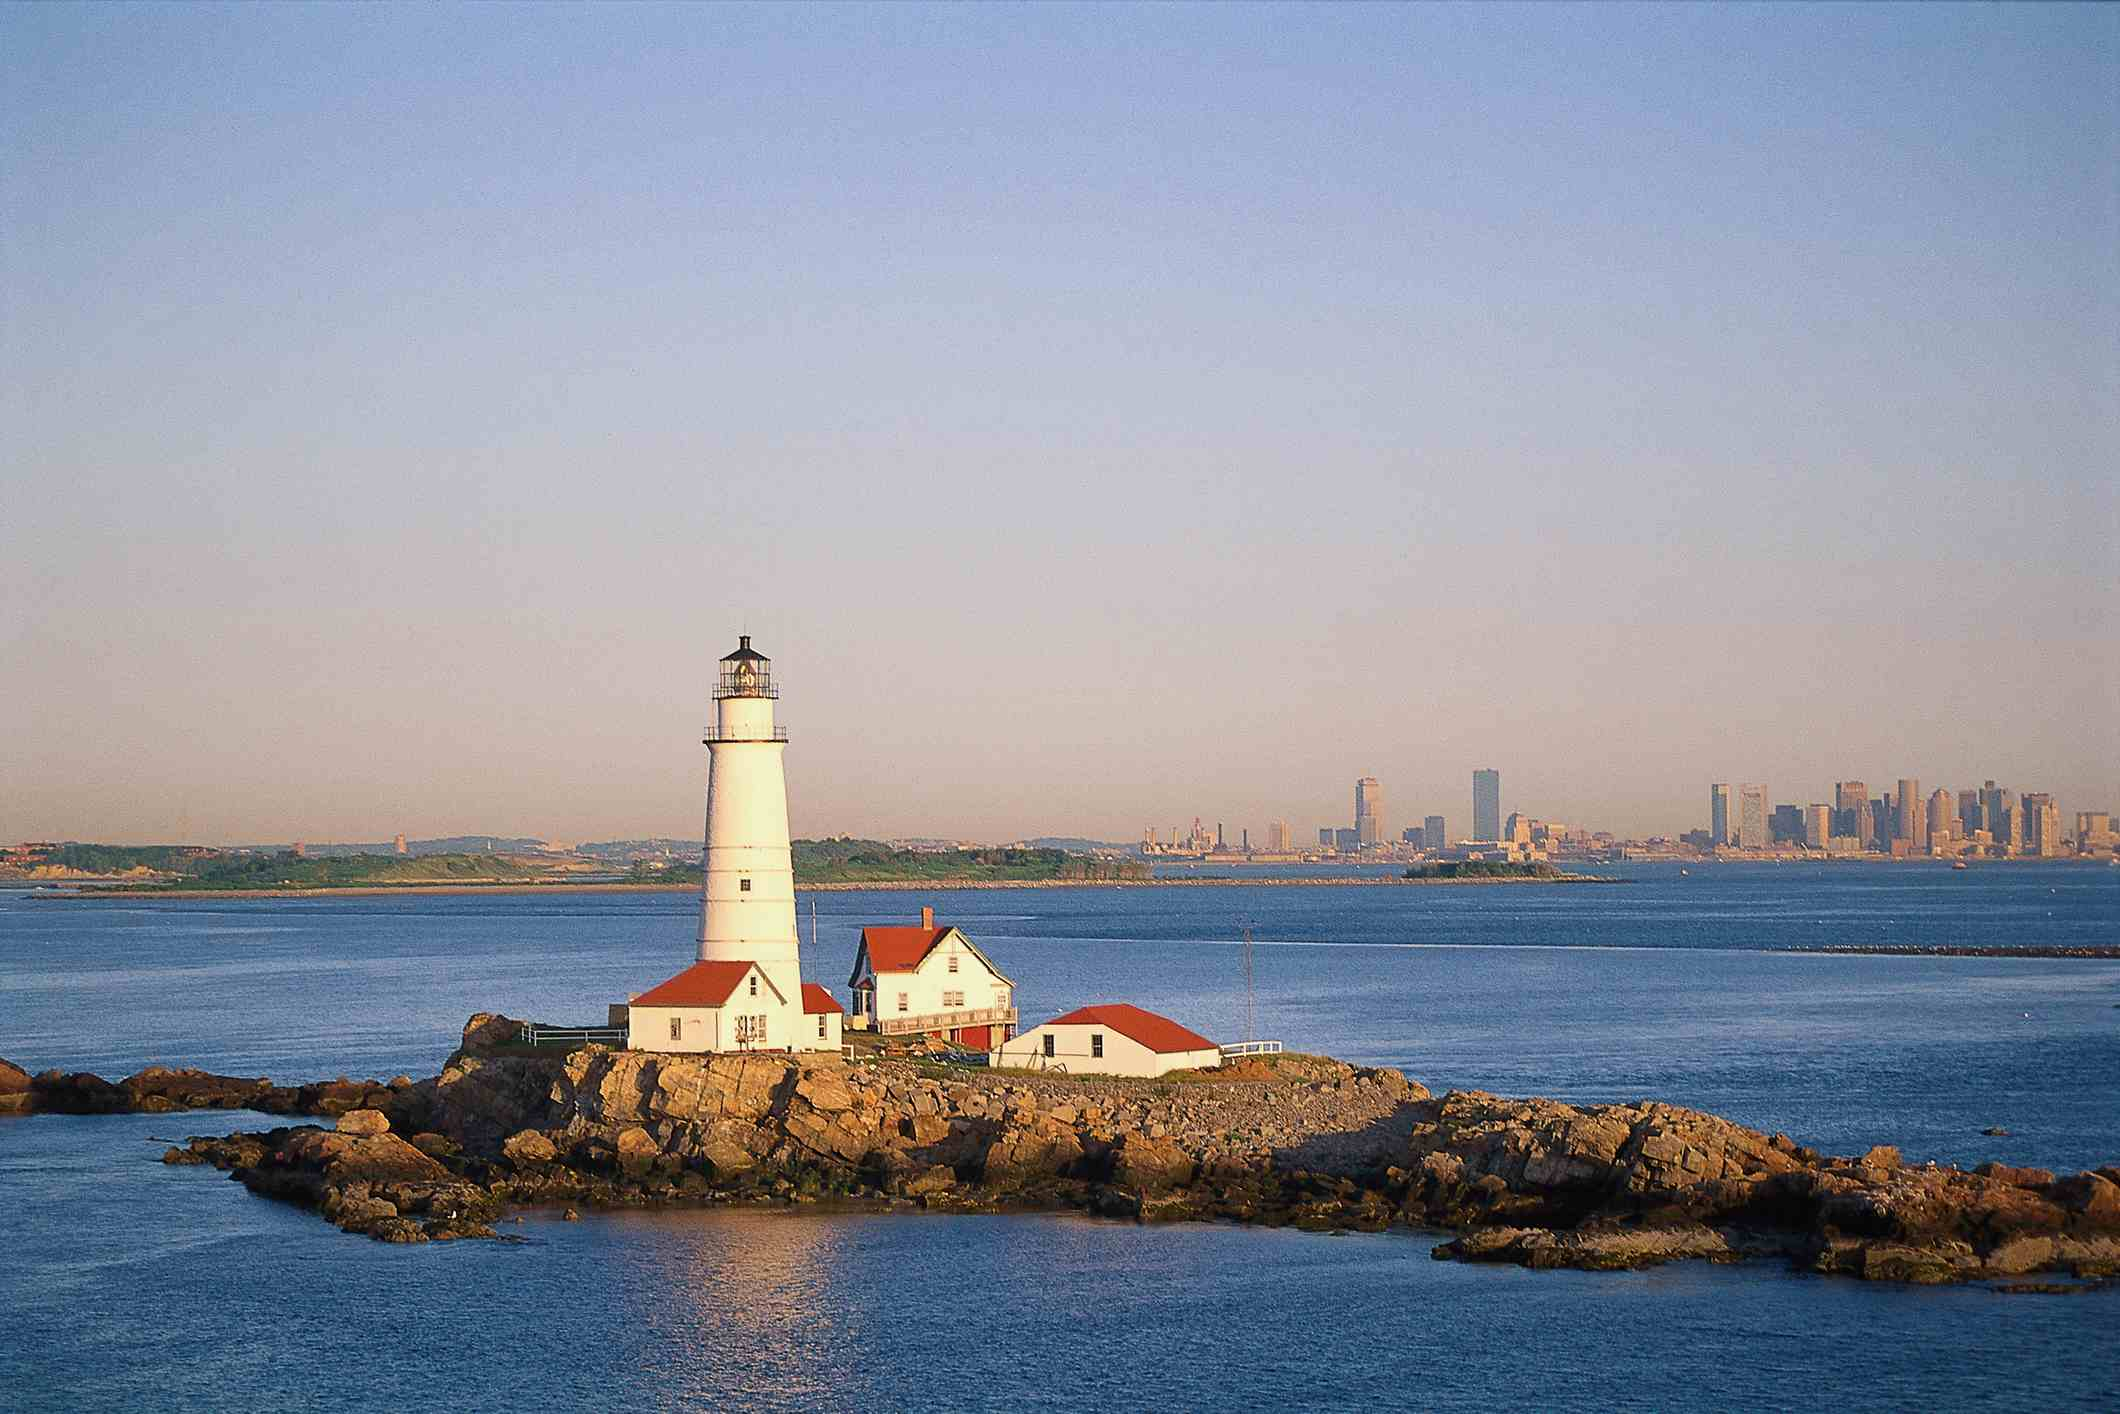 Boston Lighthouse, Boston Harbor, Massachusetts.